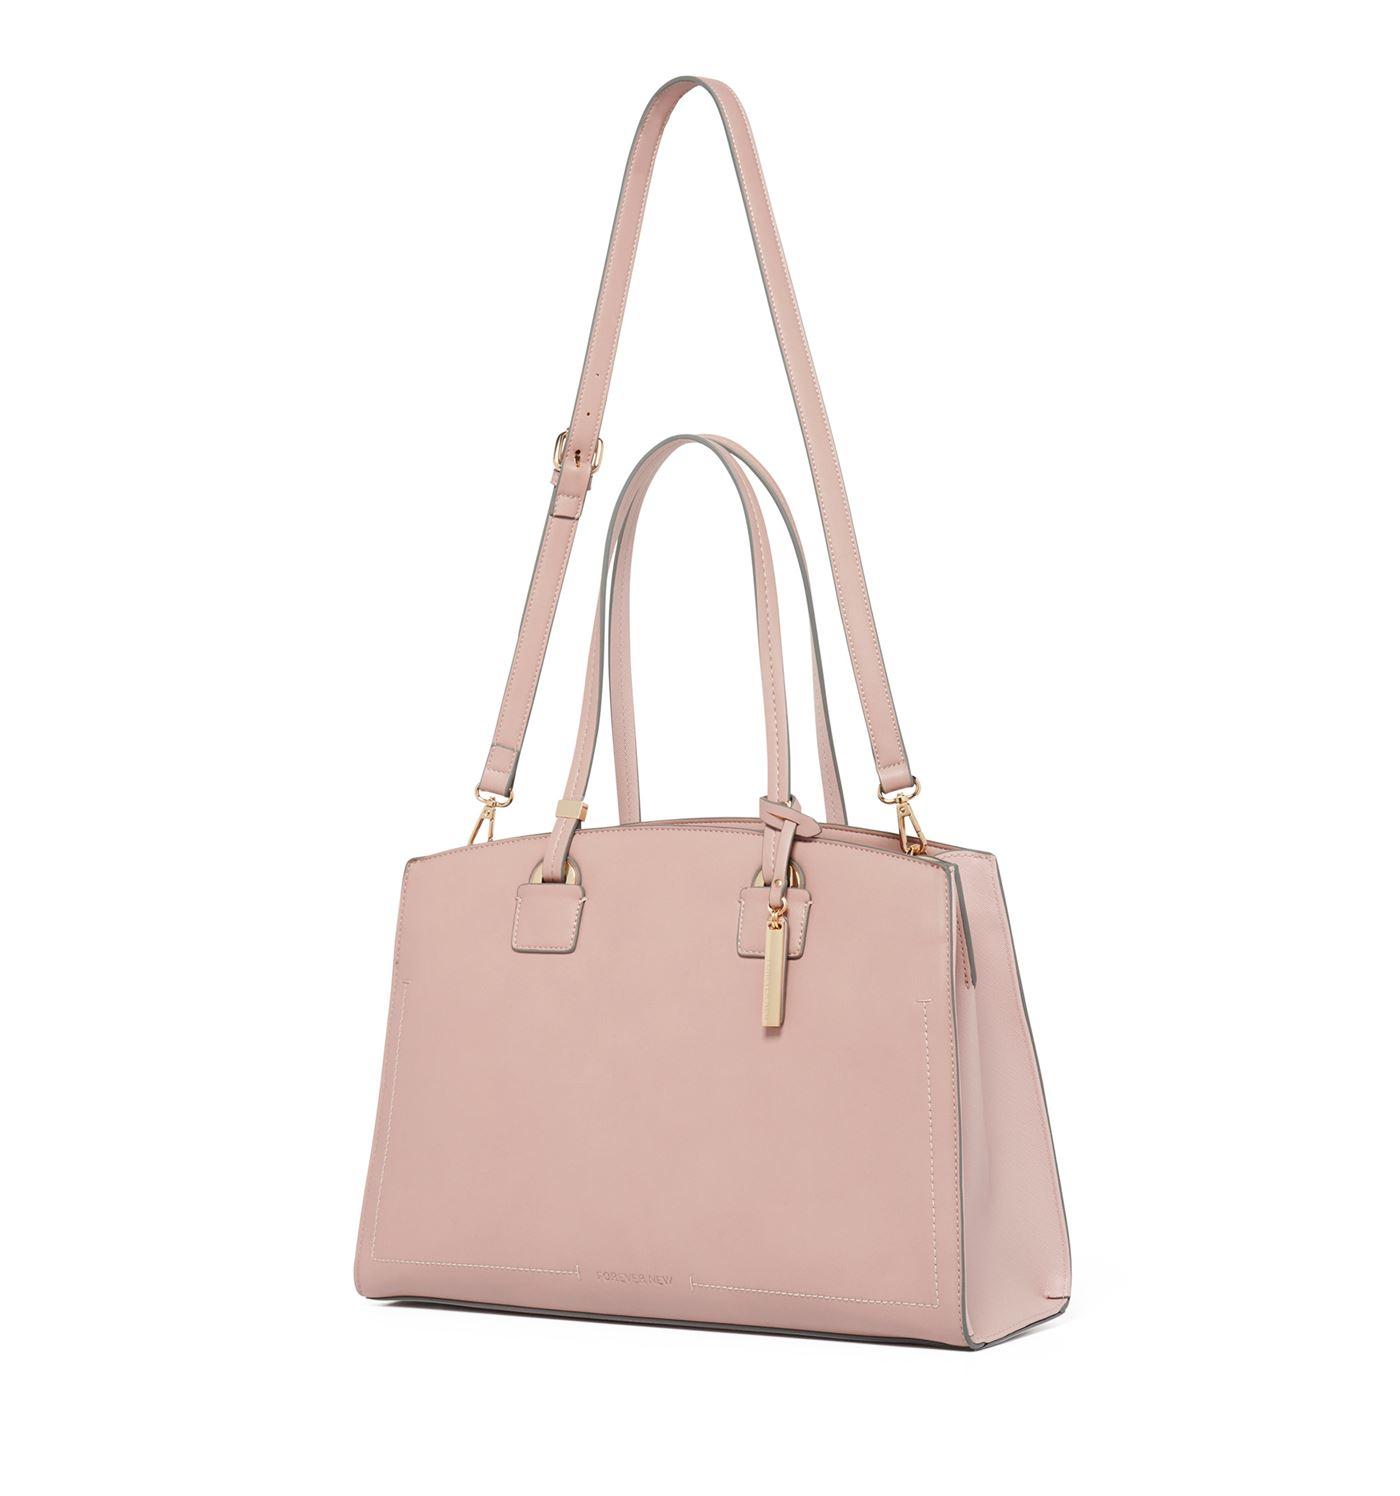 Forever New Women's Pink Laptop Bag with Detachable Shoulder Strap